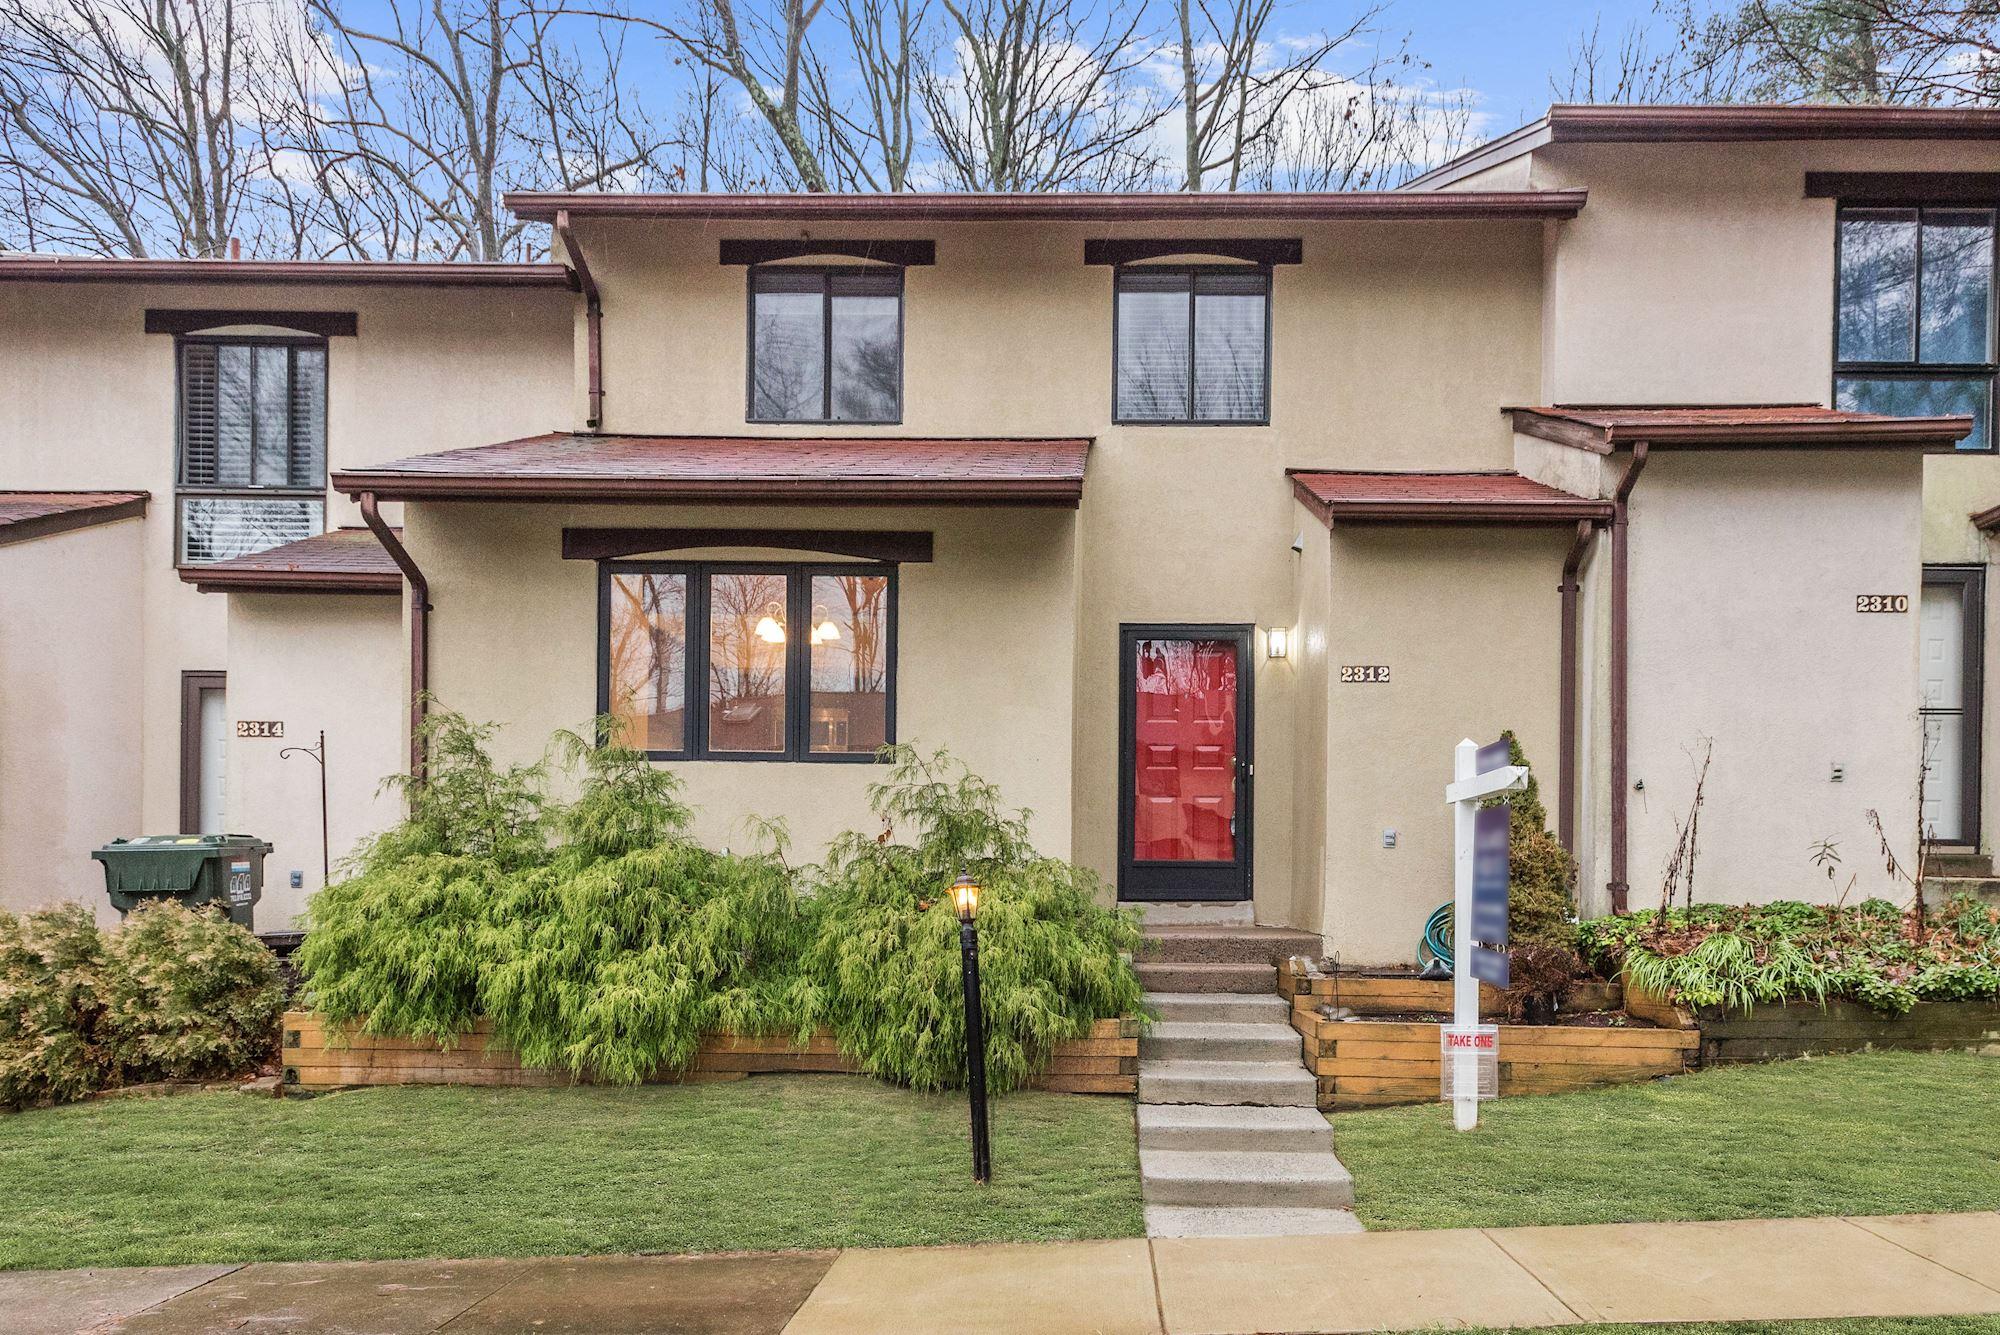 SOLD: 3 BD RenovatedContemporary Home in Reston, VA